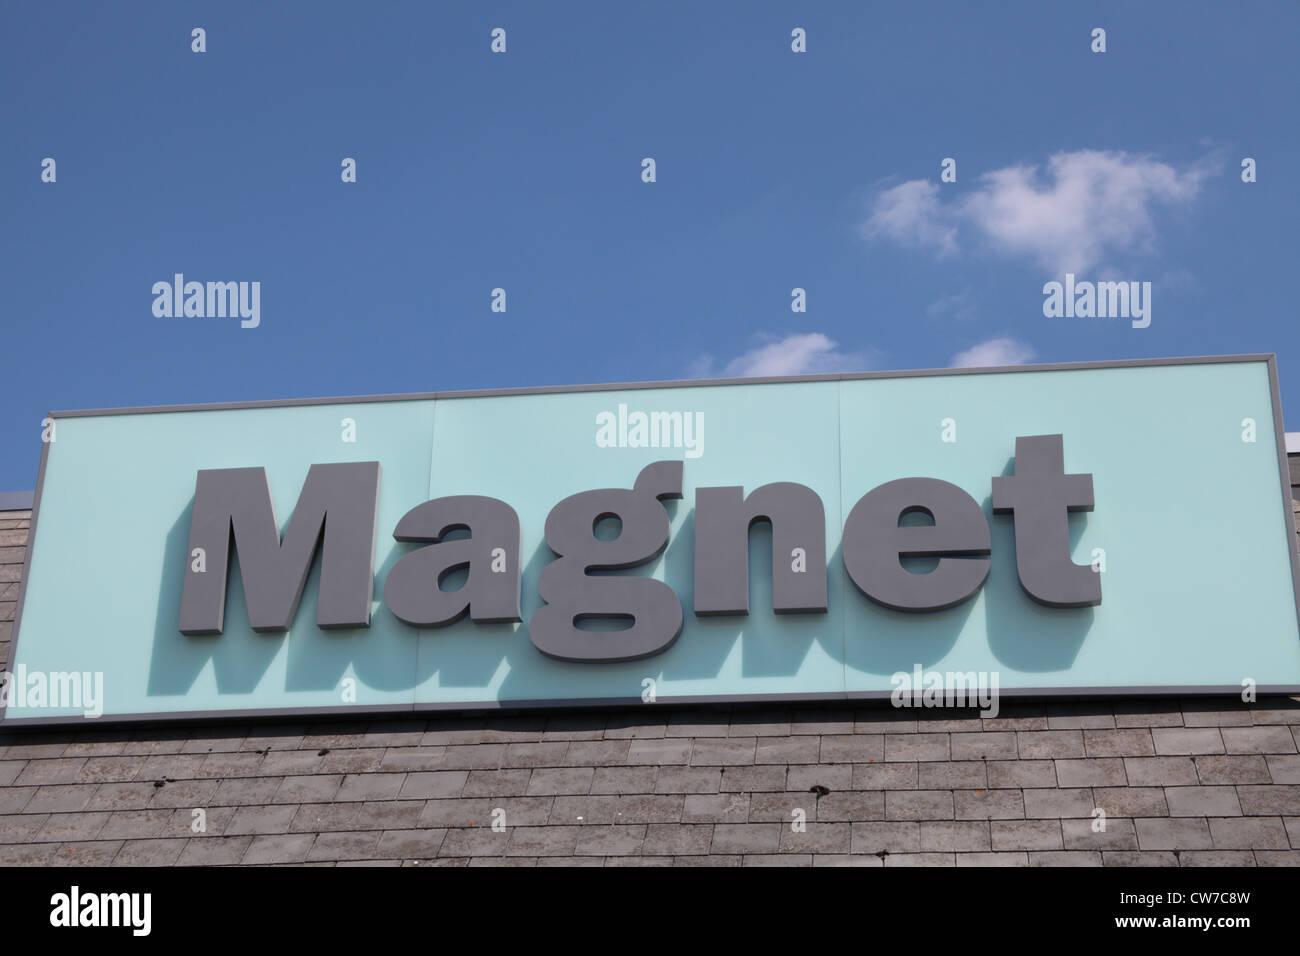 Magnet kitchens - Stock Image